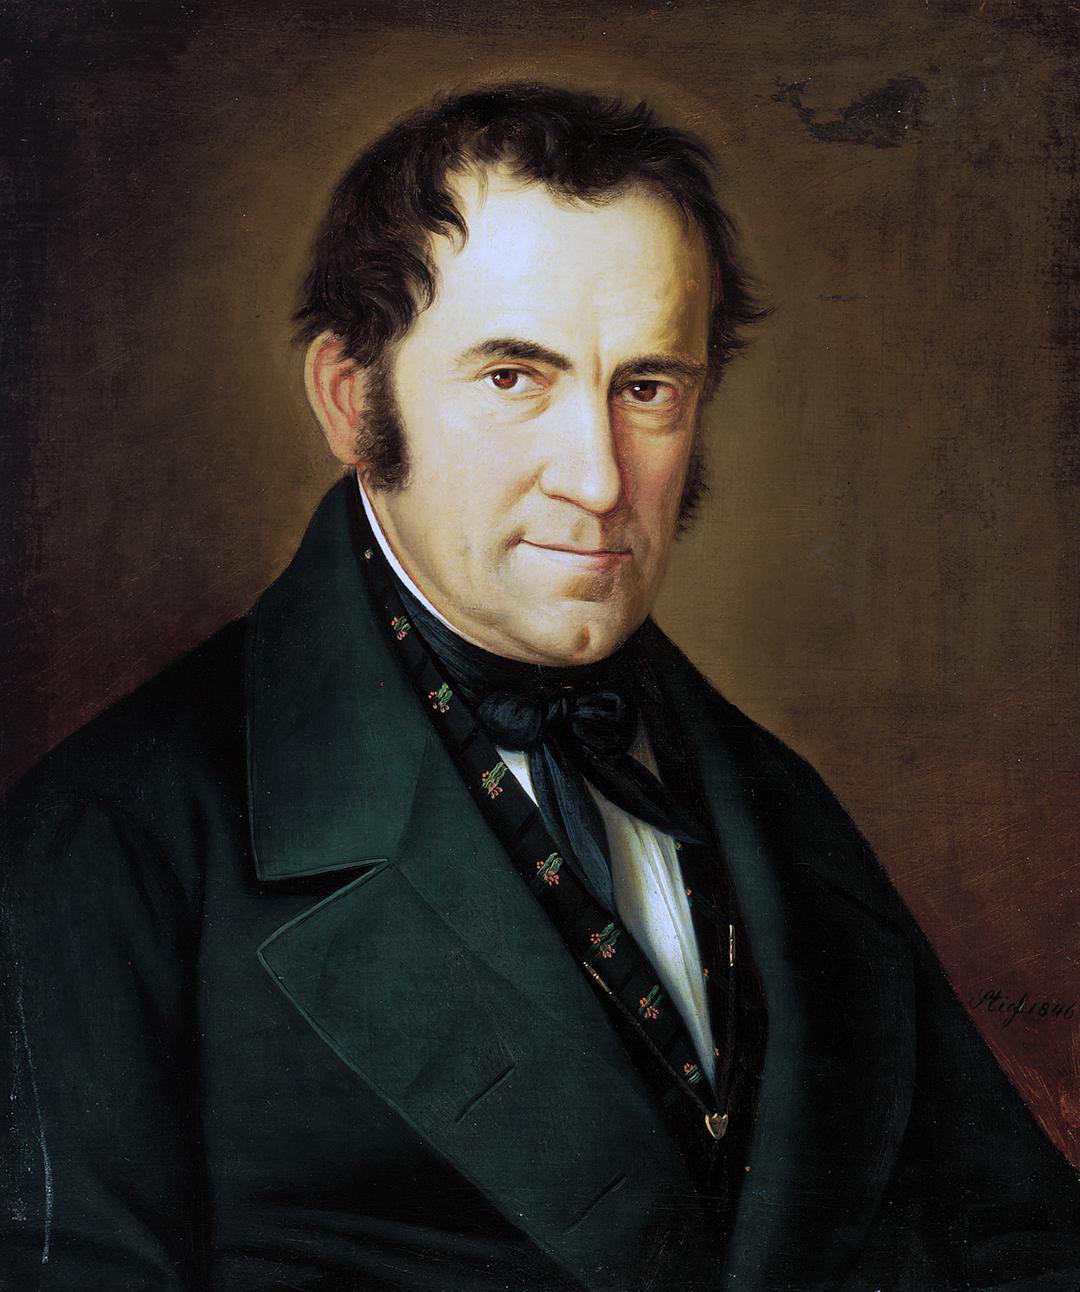 Franz Xaver Gruber, painted by Sebastian Stief (1846).